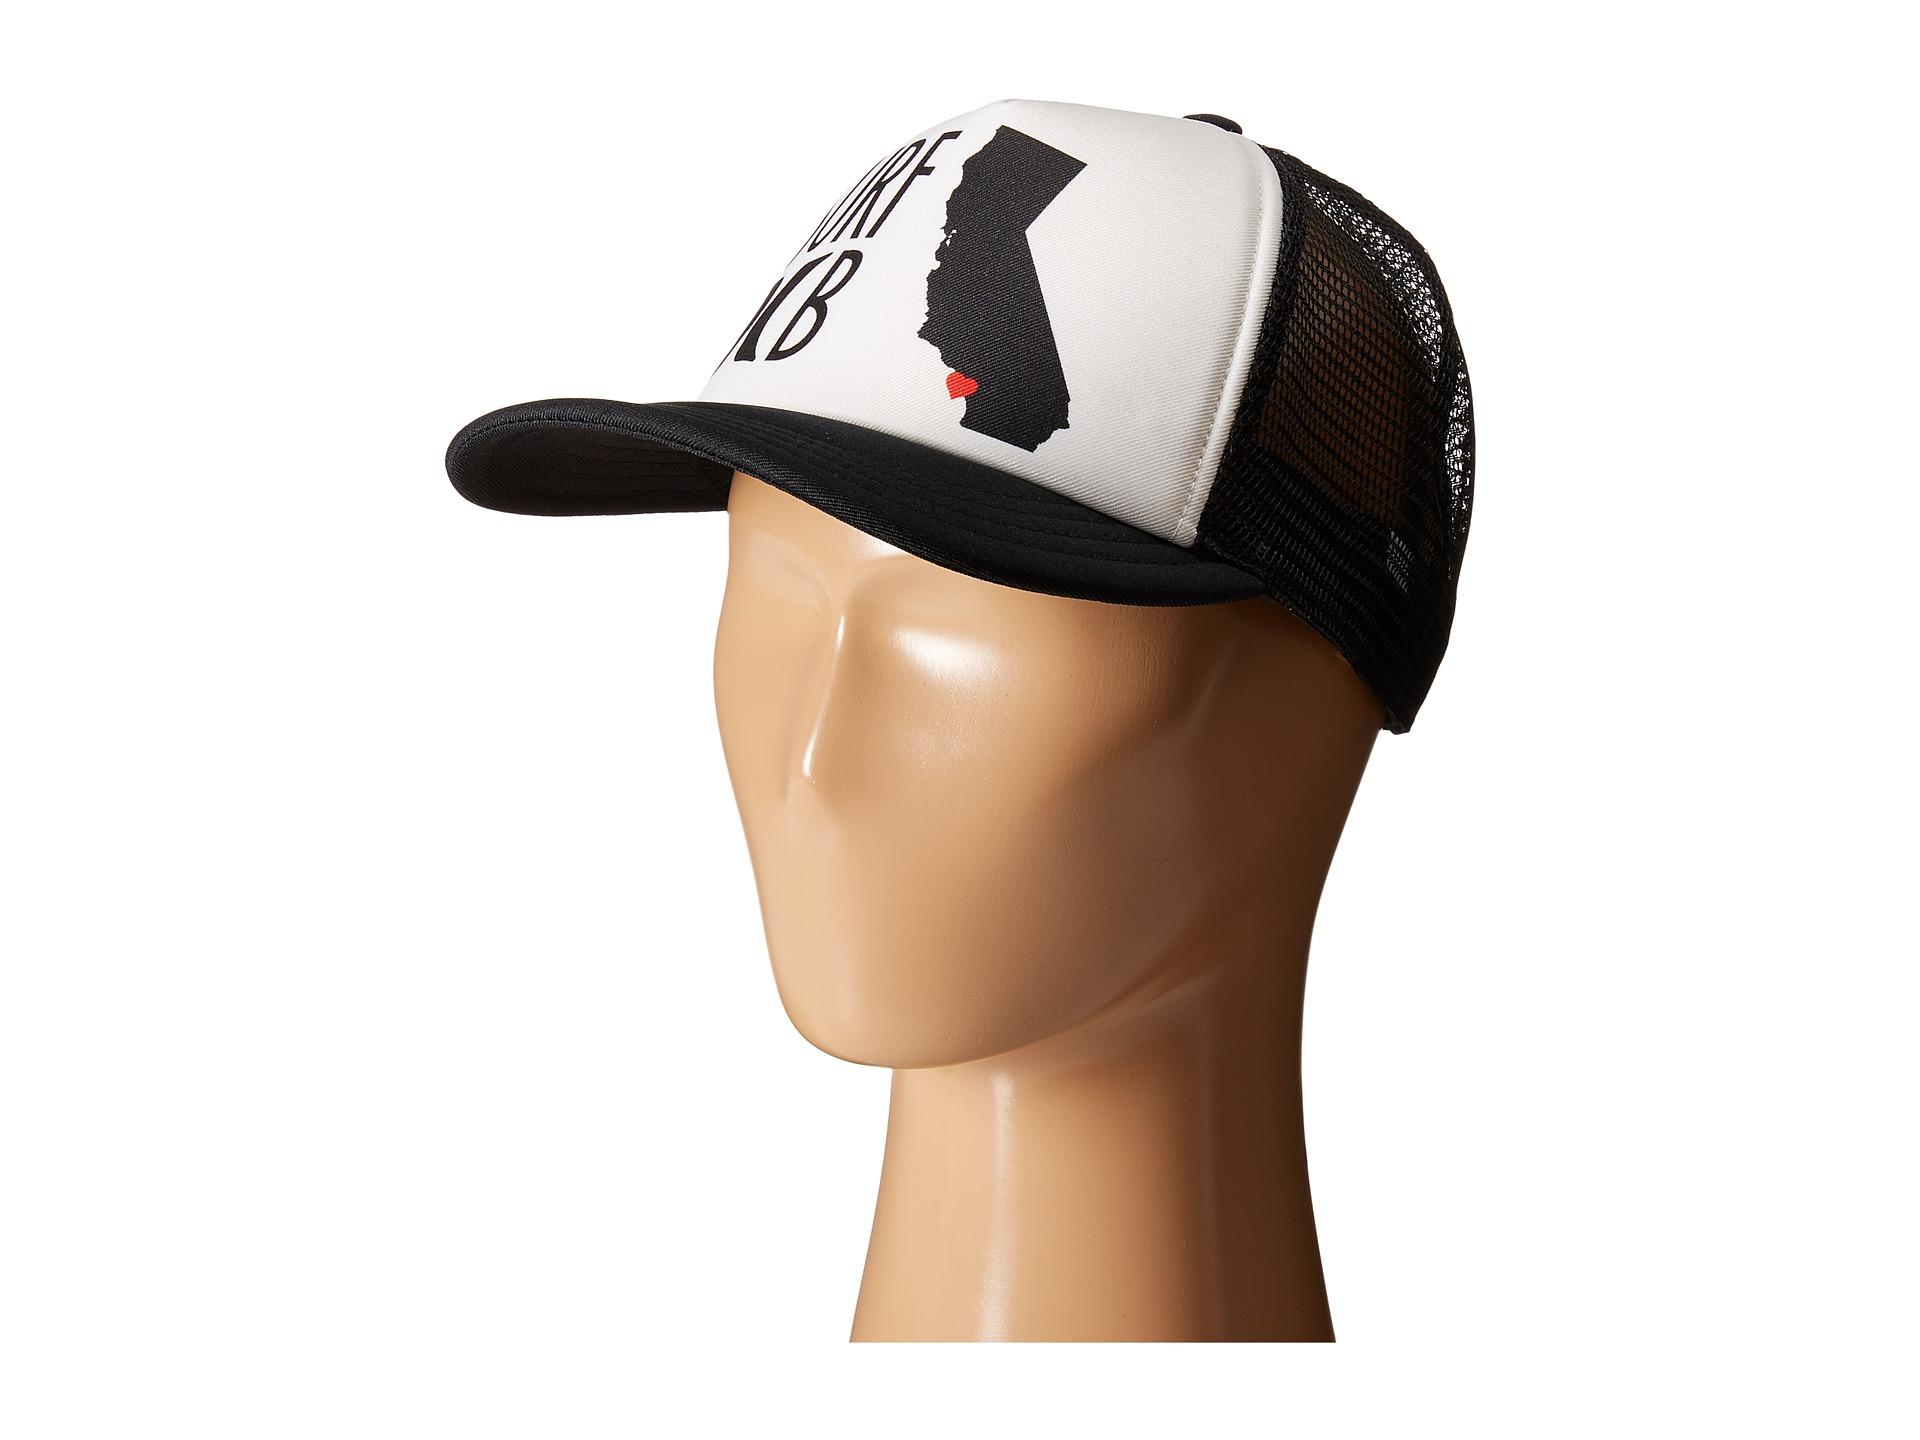 brand new 78e45 44241 ... purchase hurley beach cruiser mens snapback hat lyst hurley destination  trucker hat in black for men